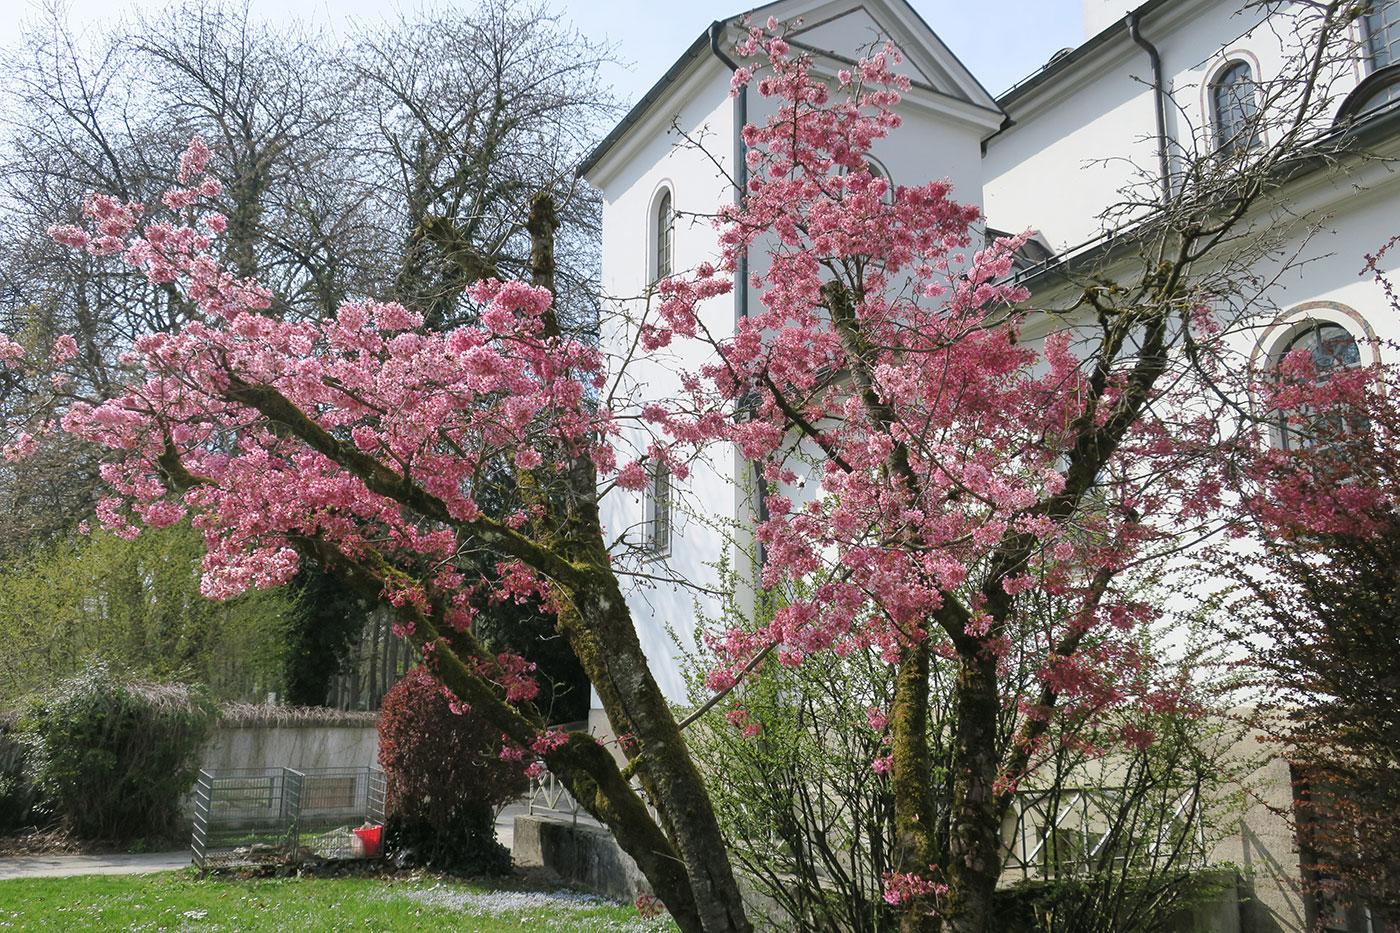 03_fruehling_ostfriedhof_2019-04-06__8568